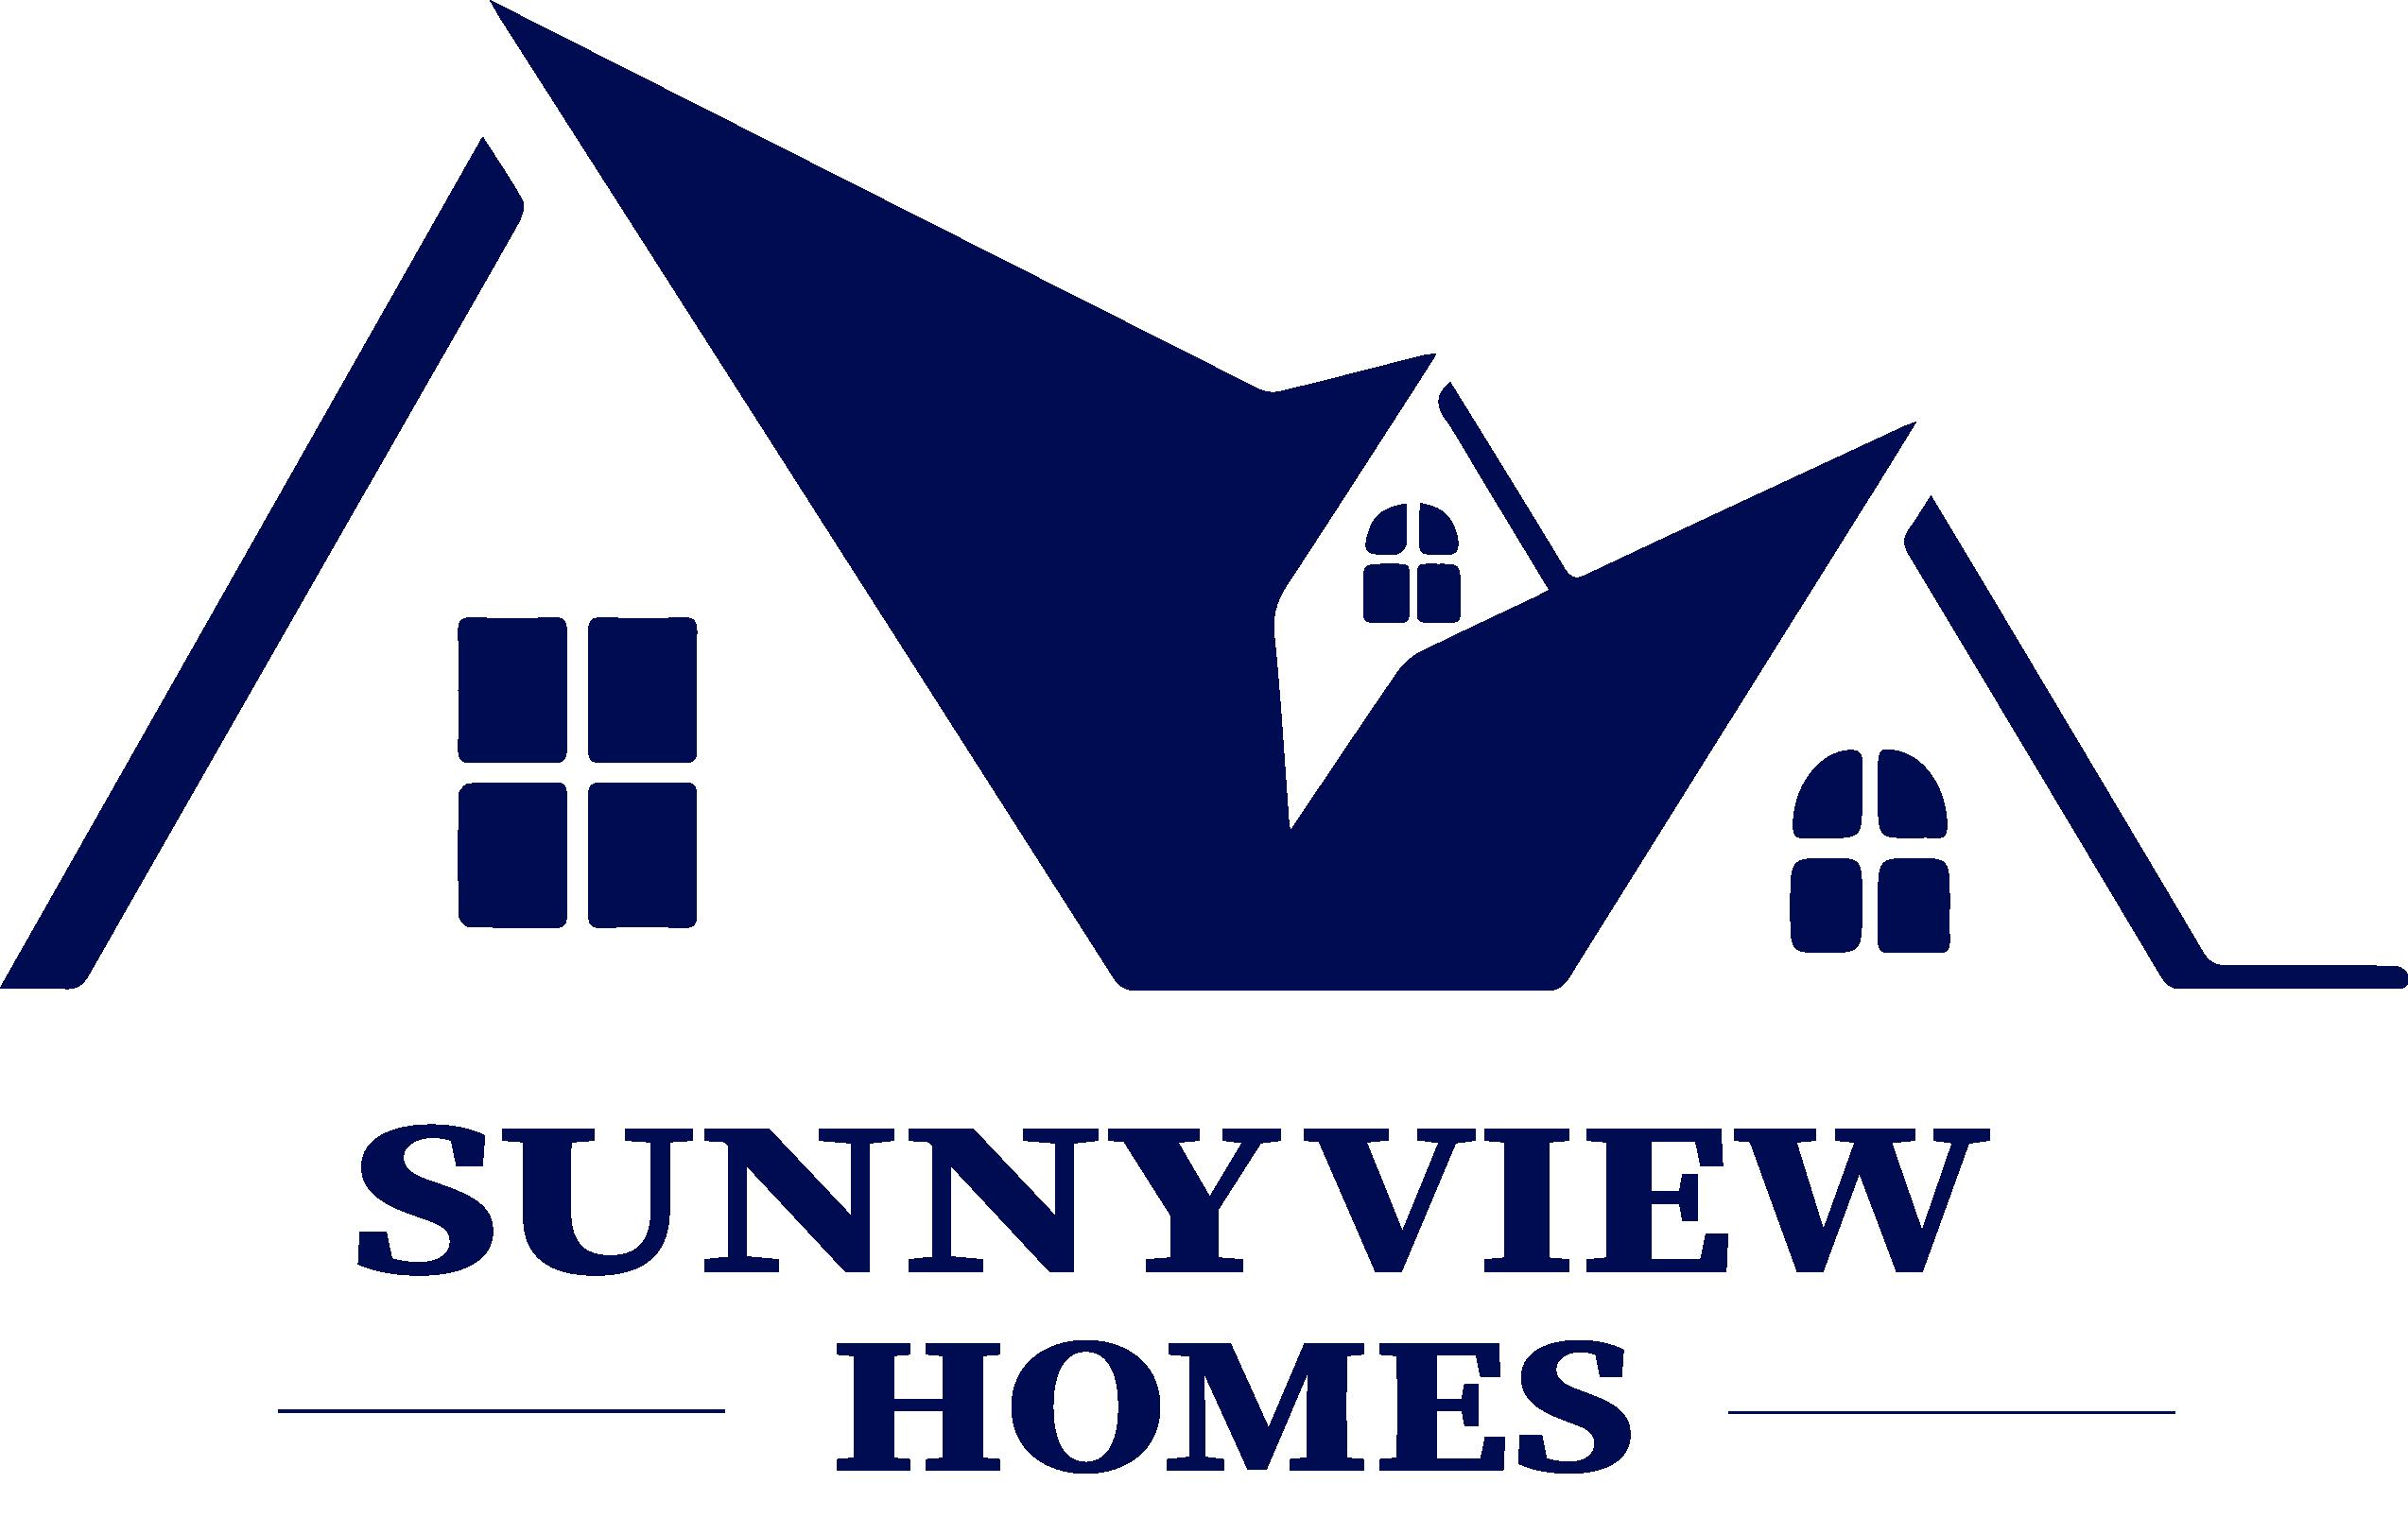 SunnyView Homes